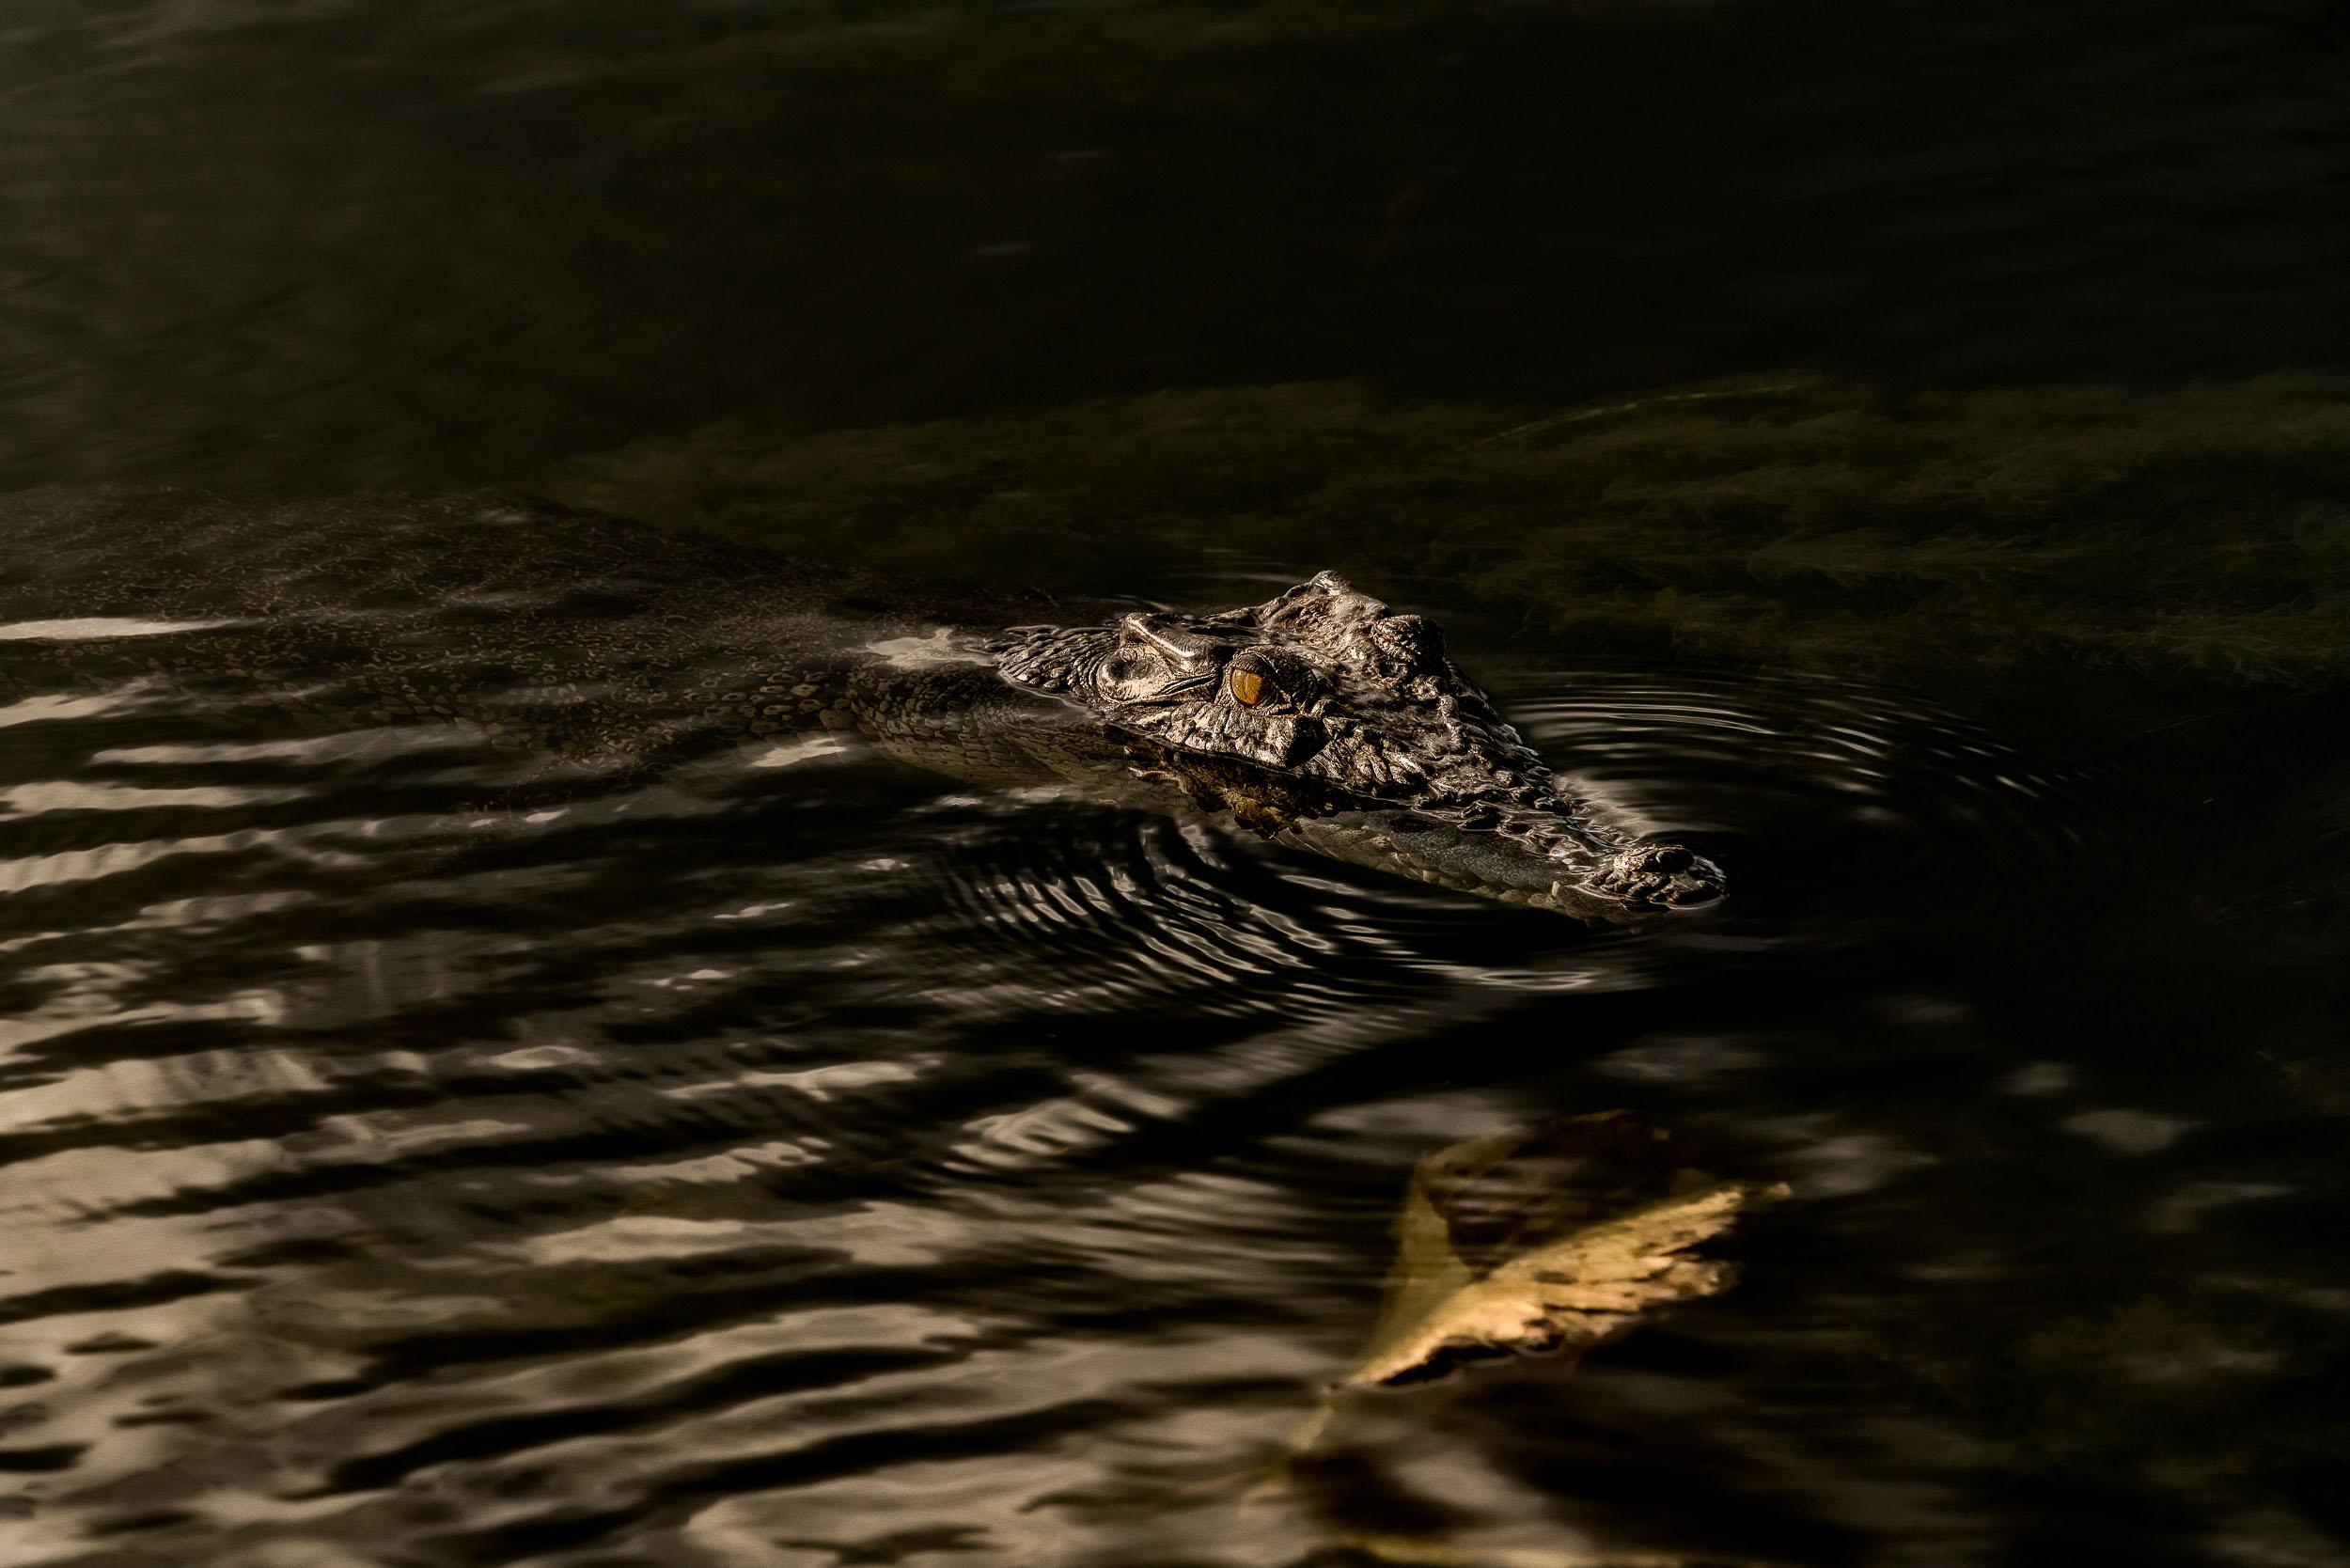 An    inquesitive crocodile    in the    Yellow Waters Billabong   , Kakadu National Park, Australia.